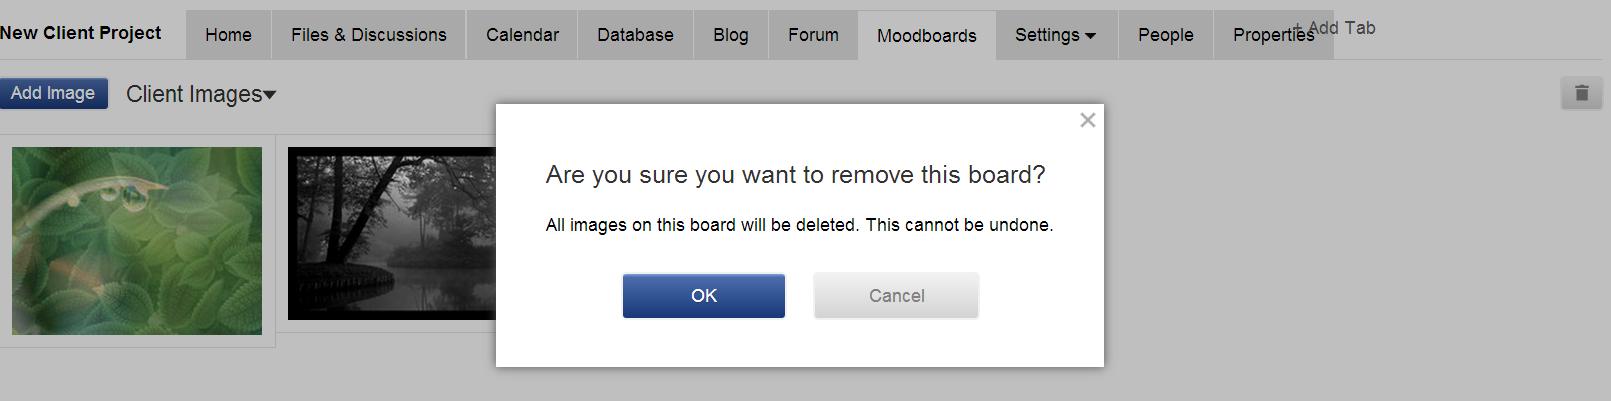 Deleting moodboard